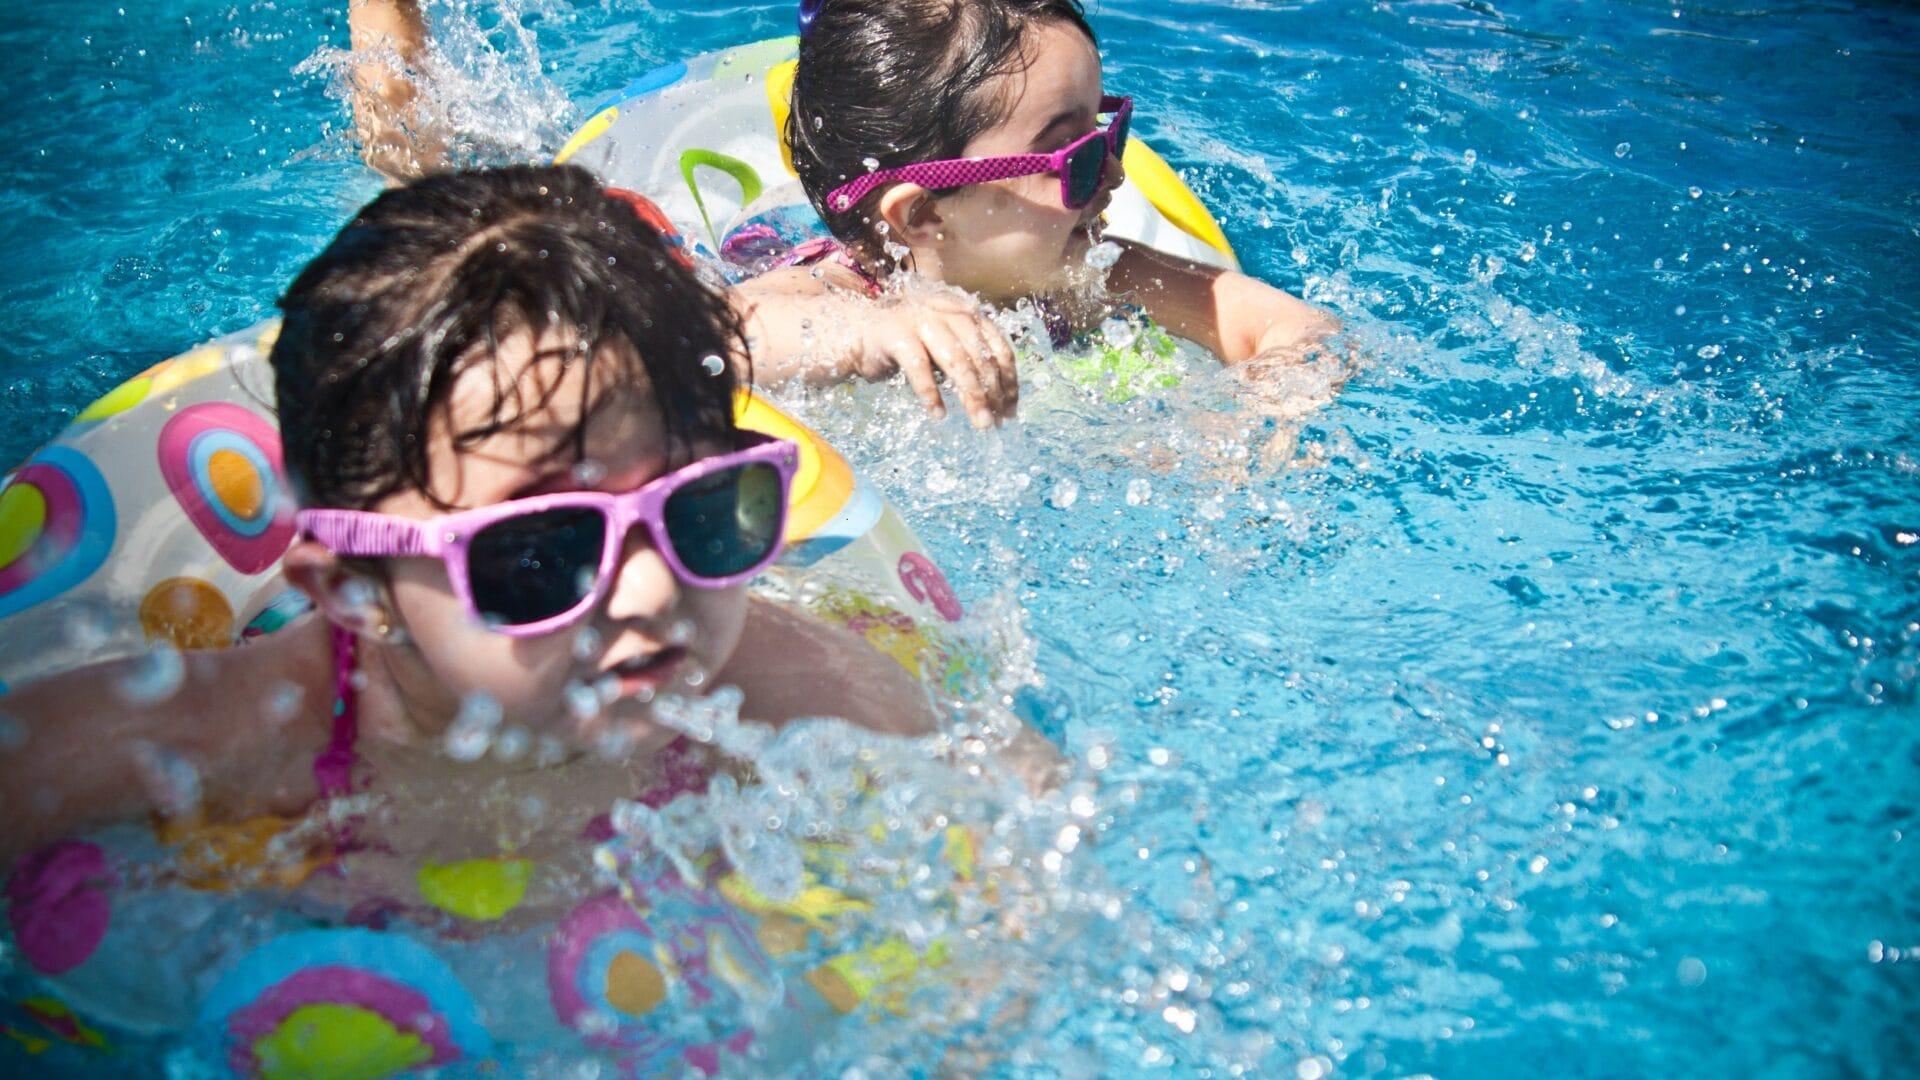 Hofgut-Apartment-lifestyle-resort-erleben-fuer-Kinder-Outdoor-Poolfun